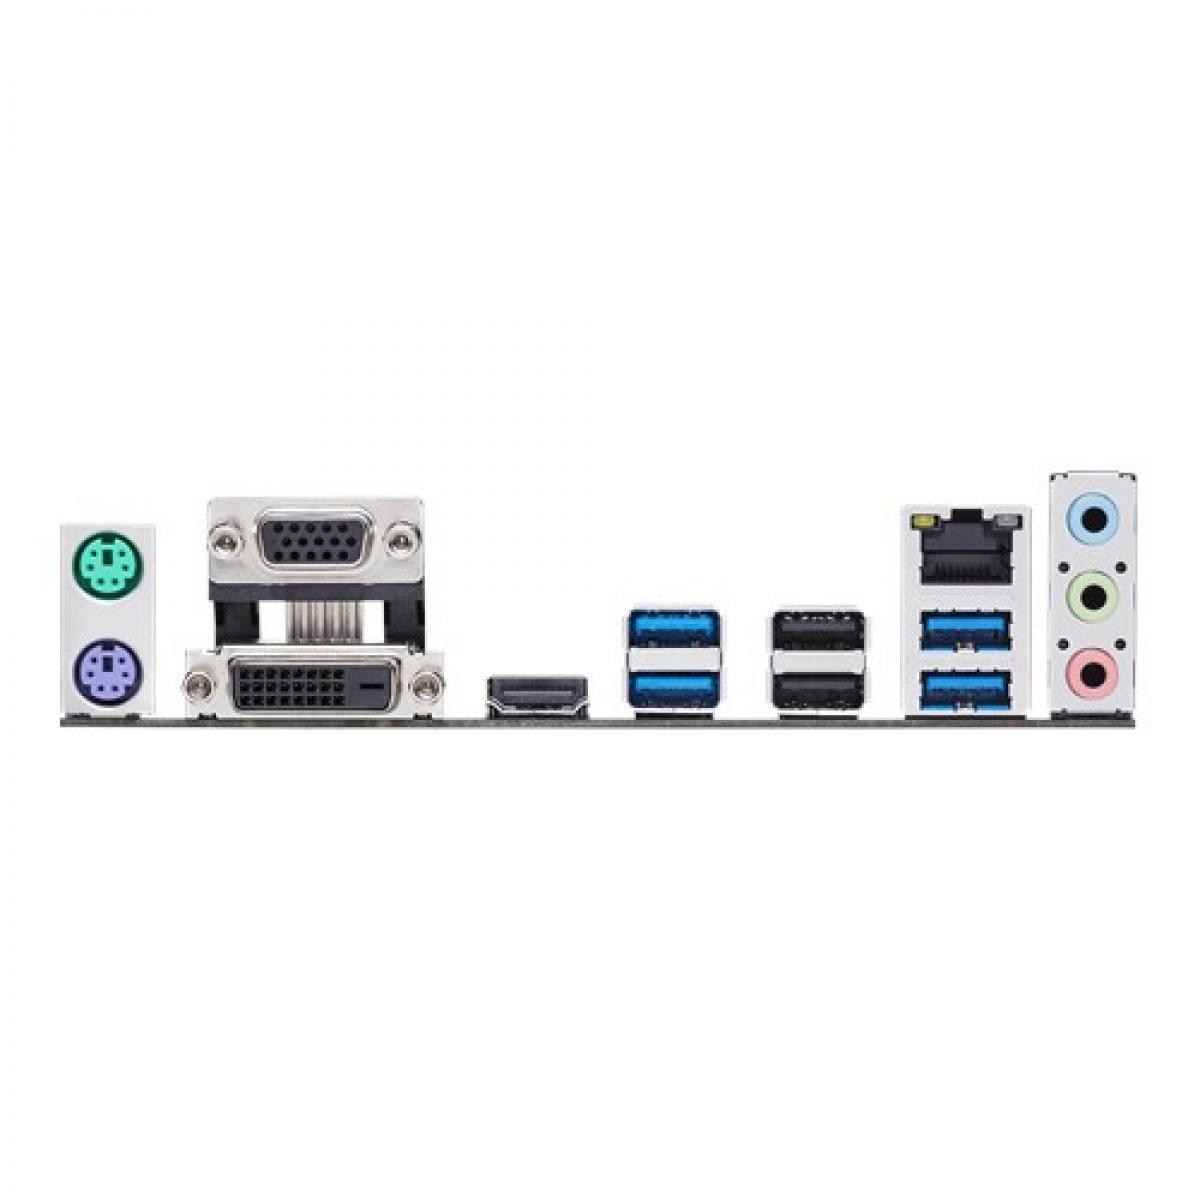 Placa Mãe Asus Prime A320M-A, Chipset A320, AMD AM4, mATX, DDR4